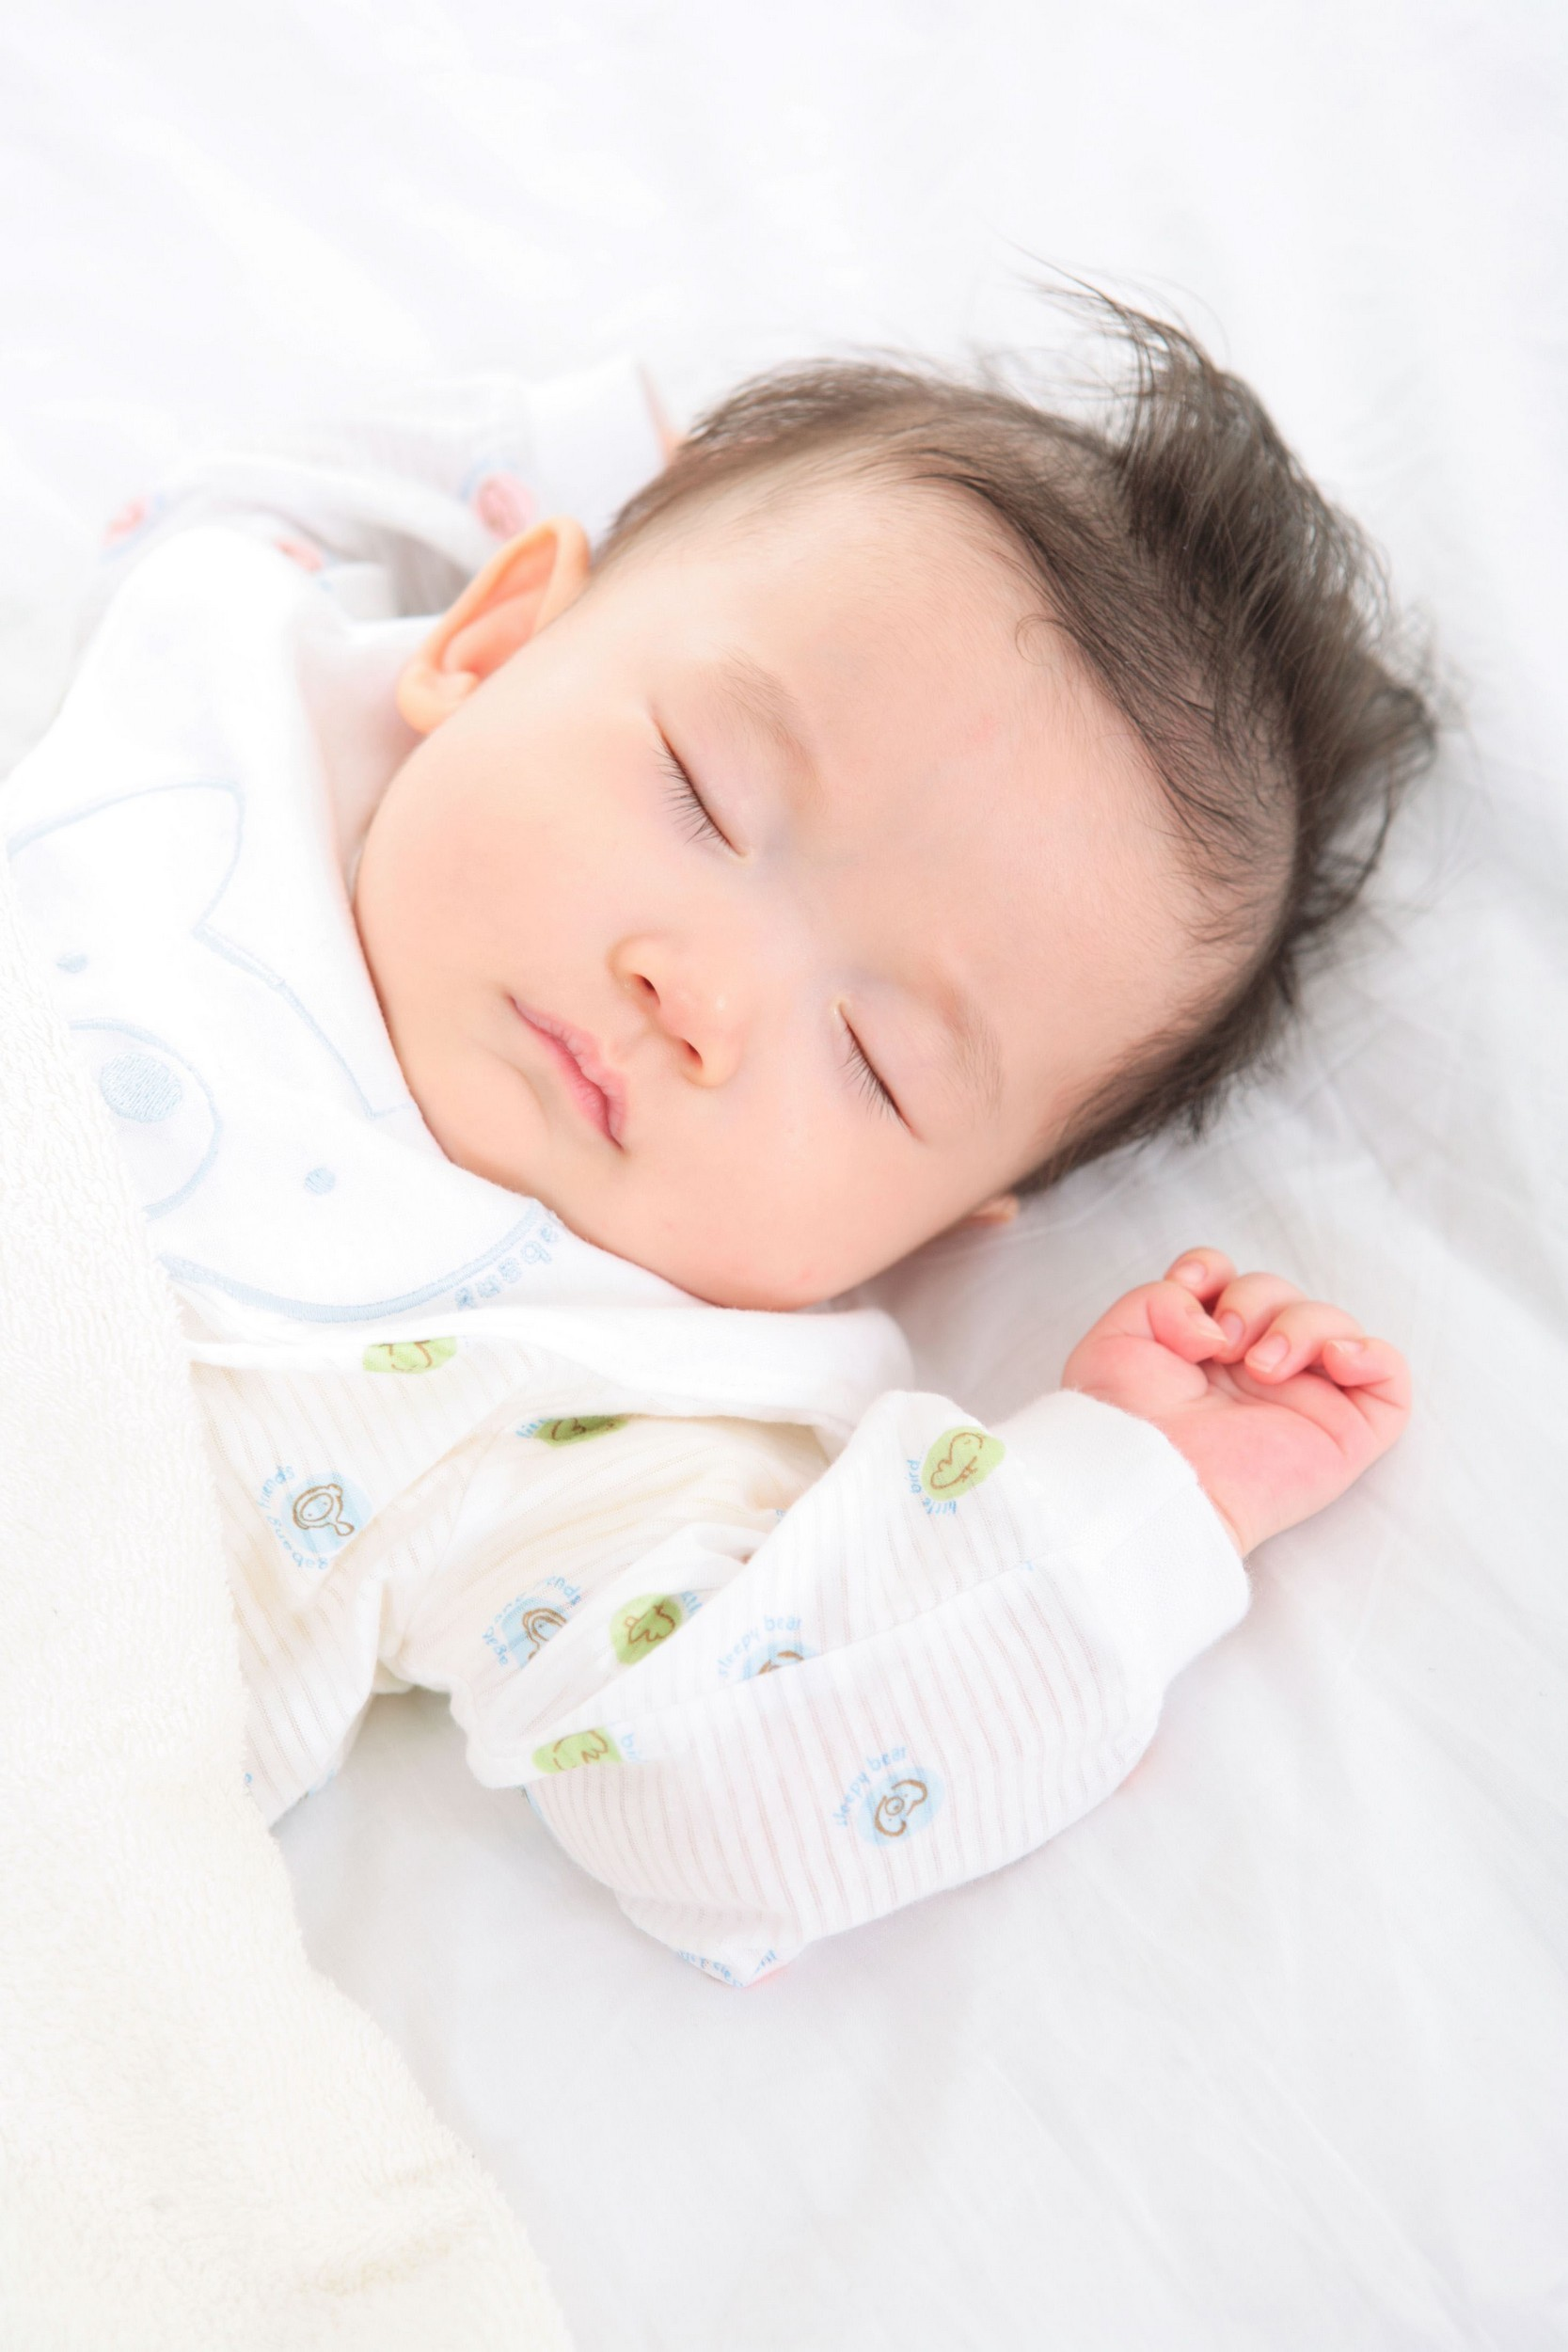 Asleep when you wish they were awake?